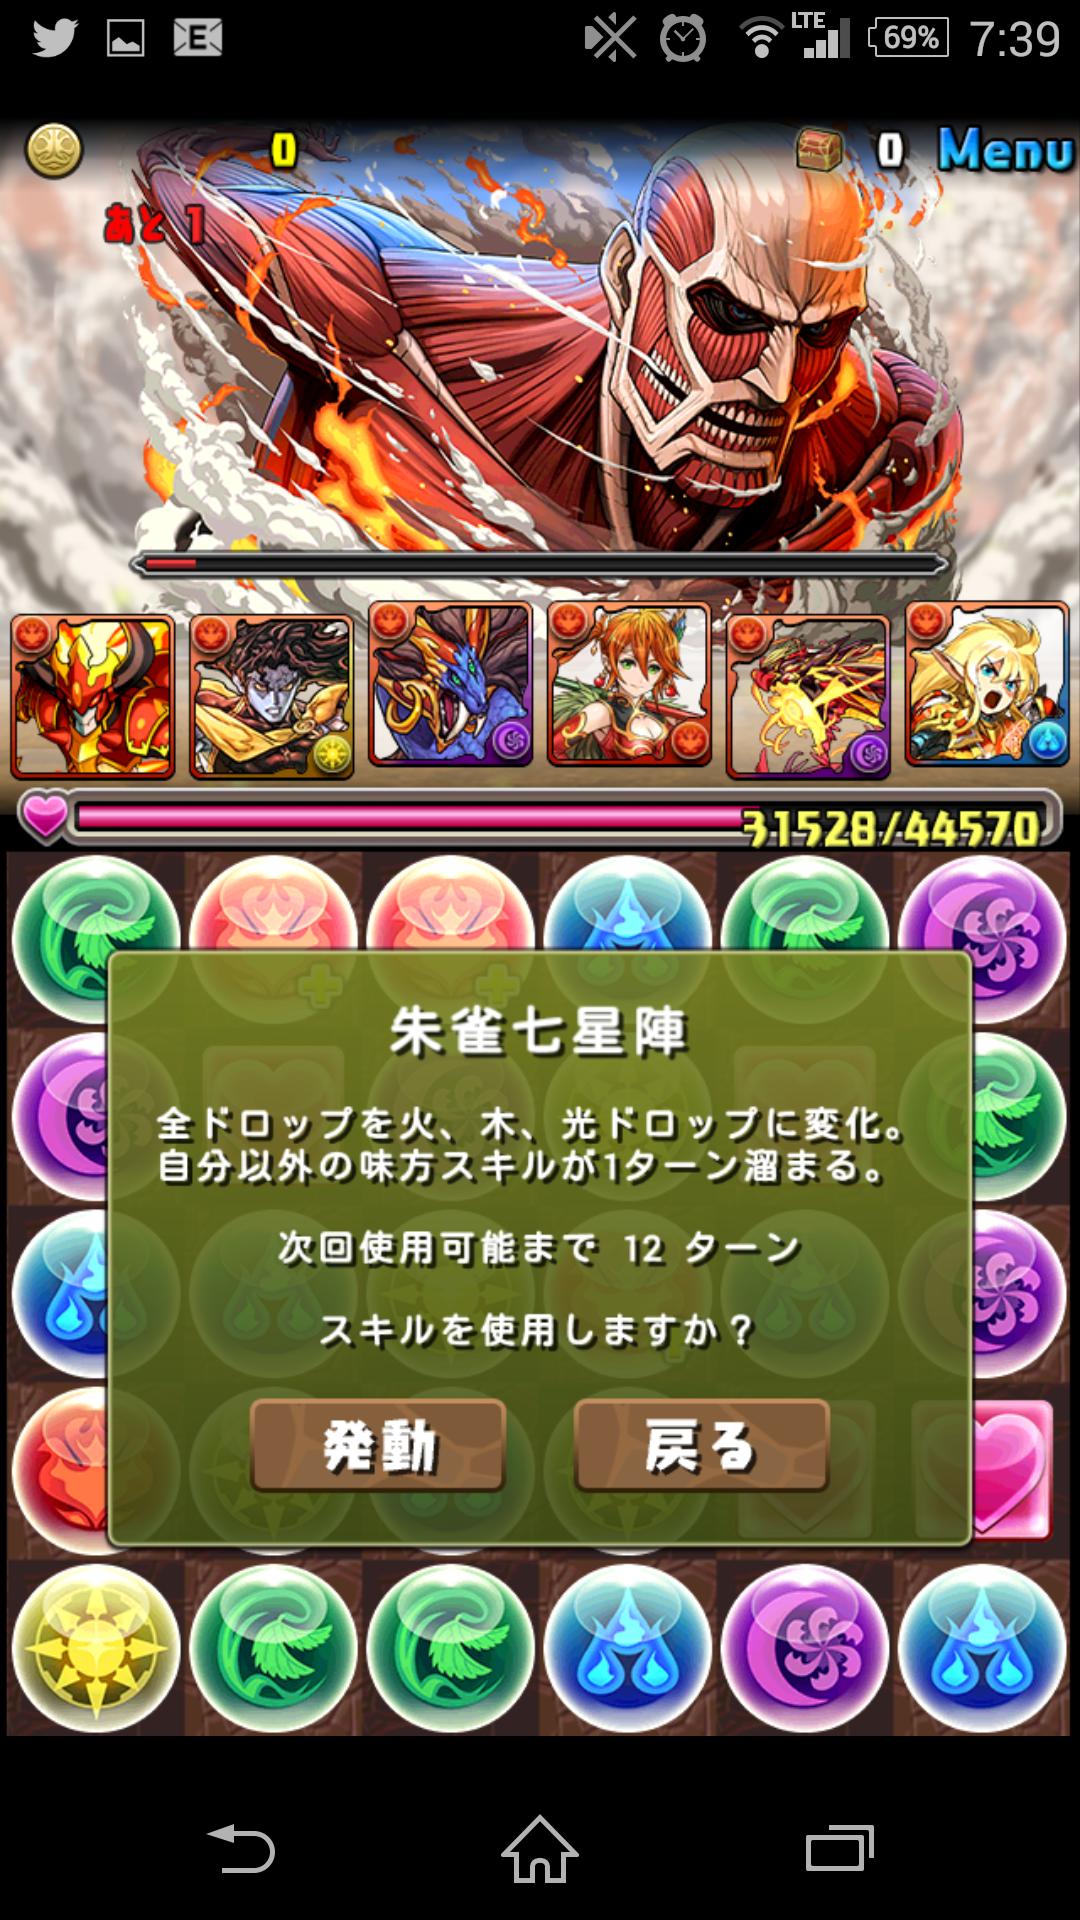 Screenshot_2015-10-03-19-39-29.png